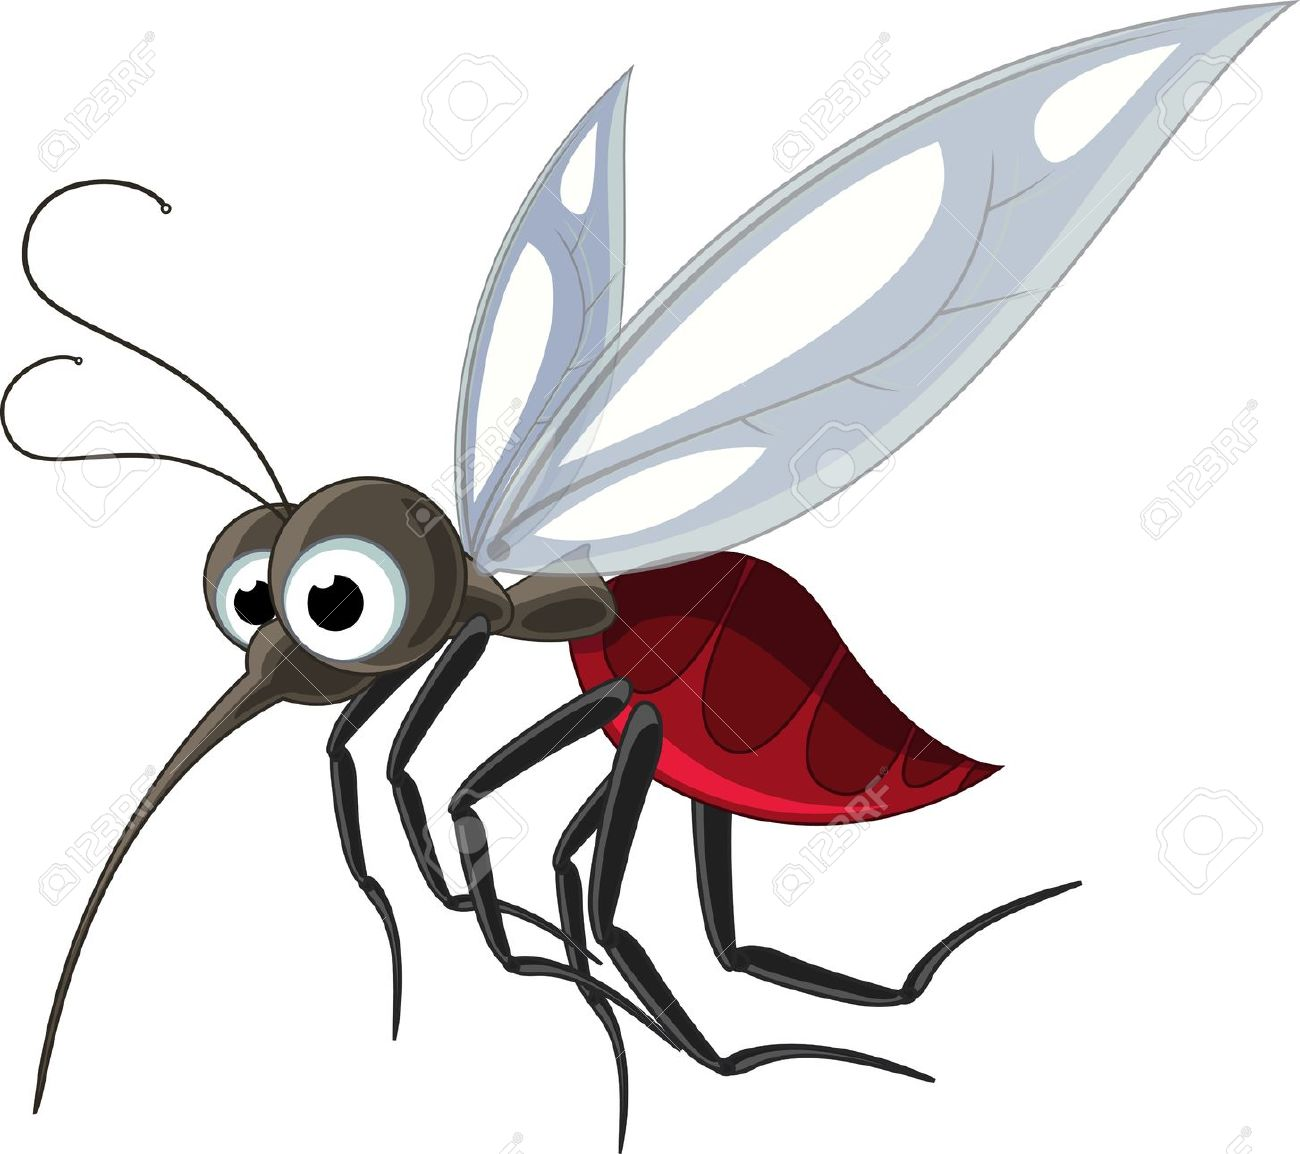 Mosquito clipart 2 3